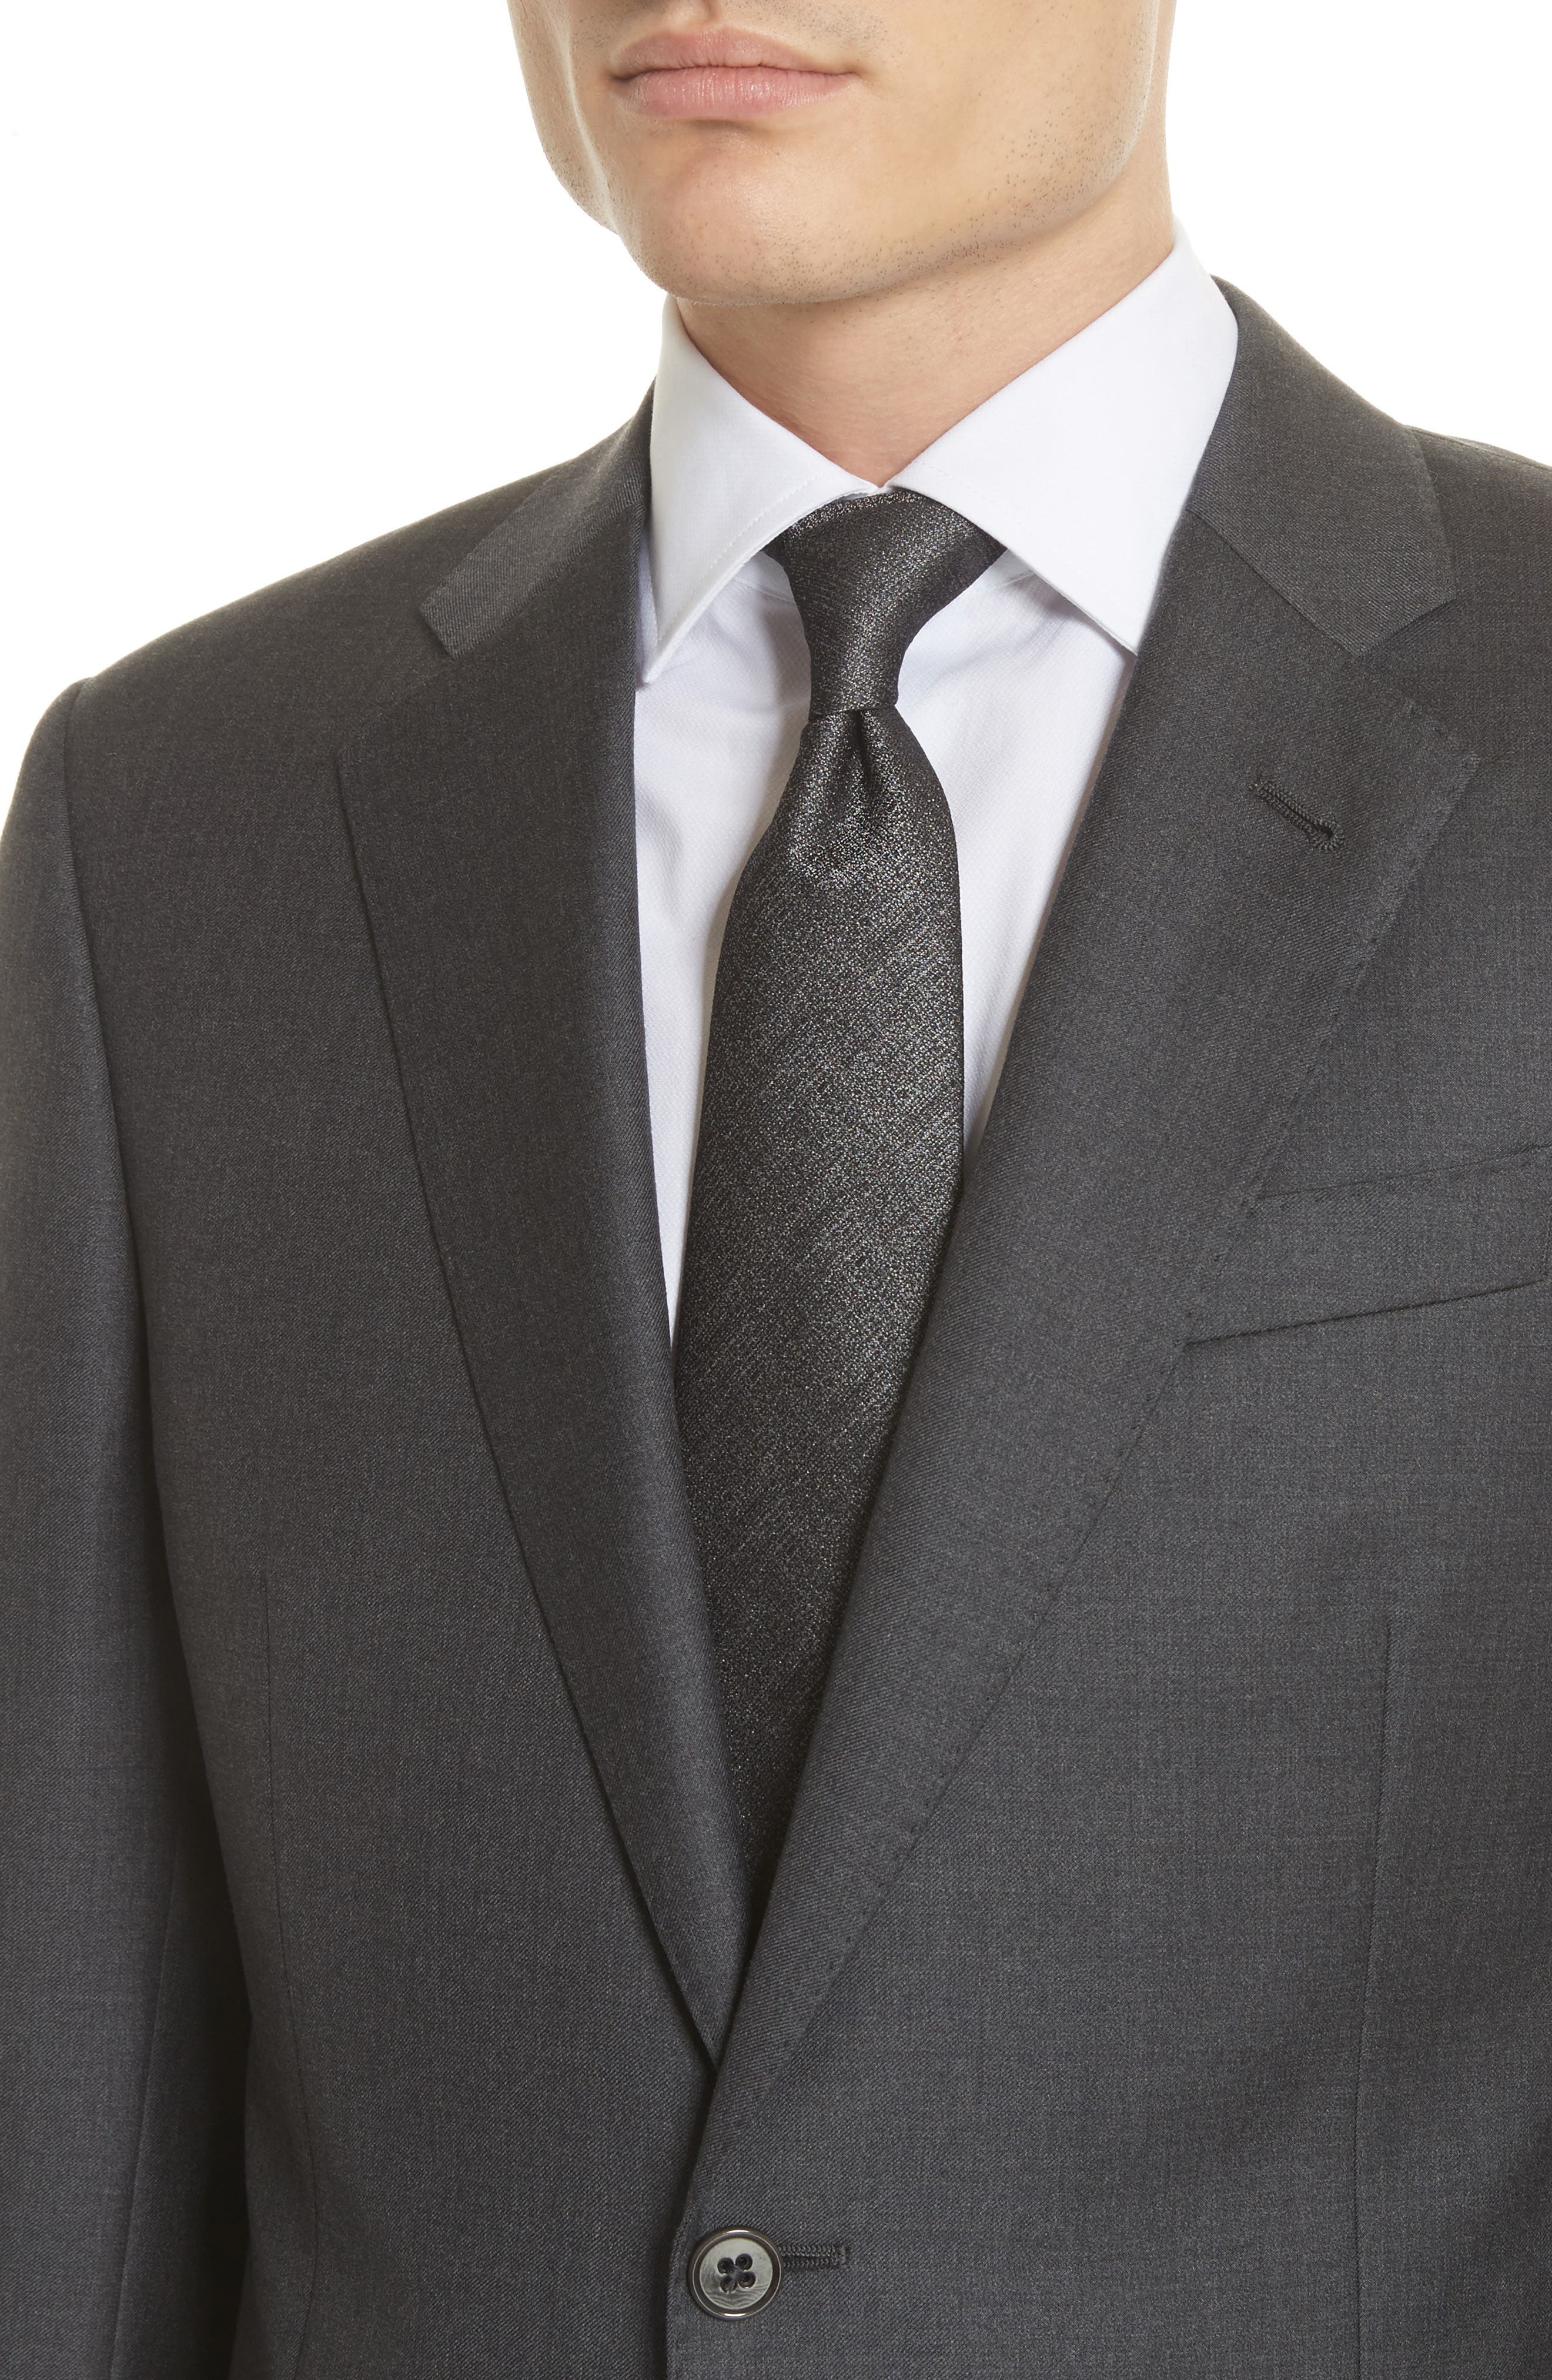 Trim Fit Solid Wool Suit,                             Alternate thumbnail 4, color,                             Grey